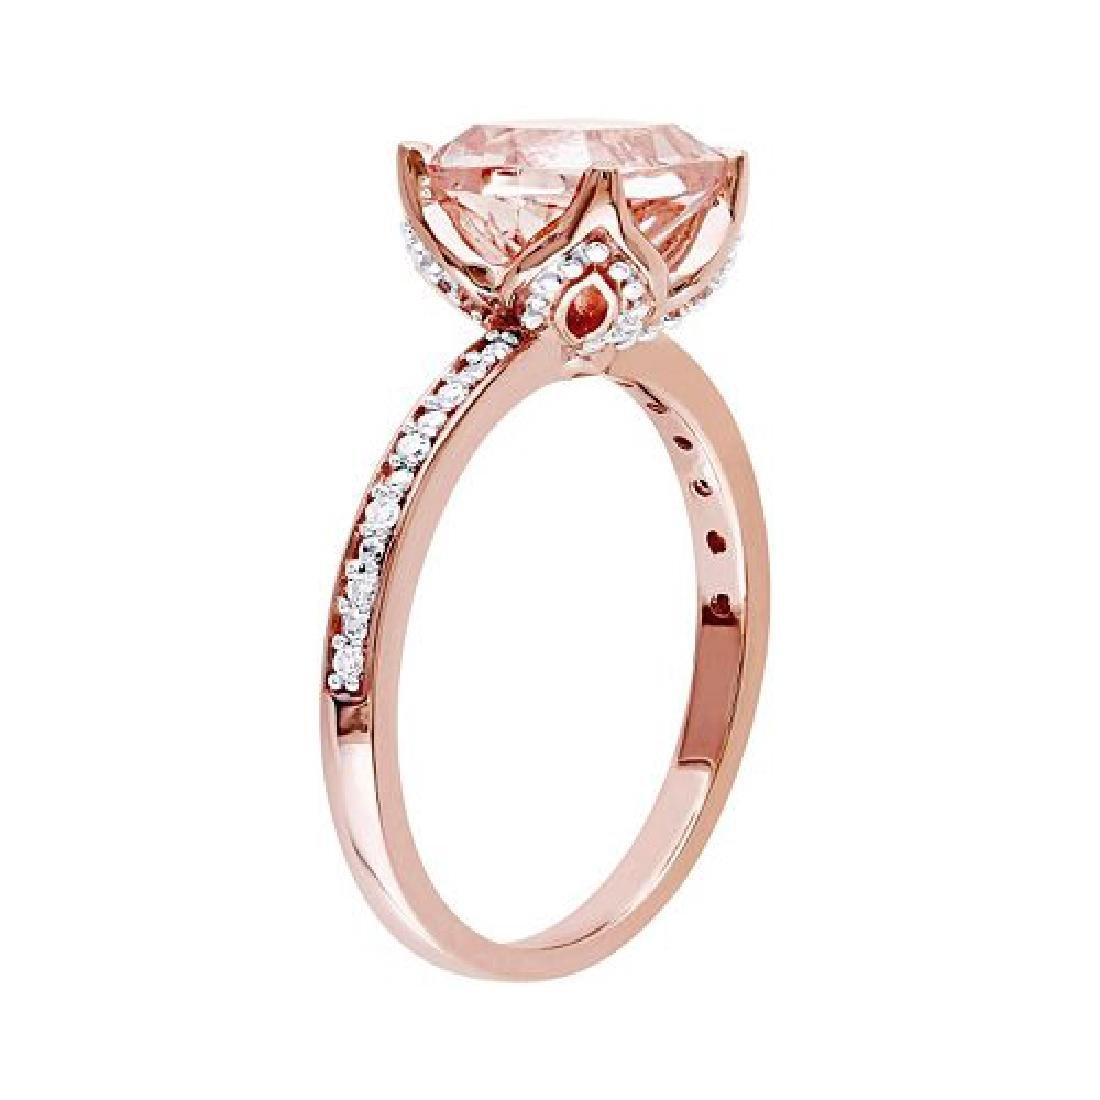 10k Rose Gold Morganite and Diamond Ring